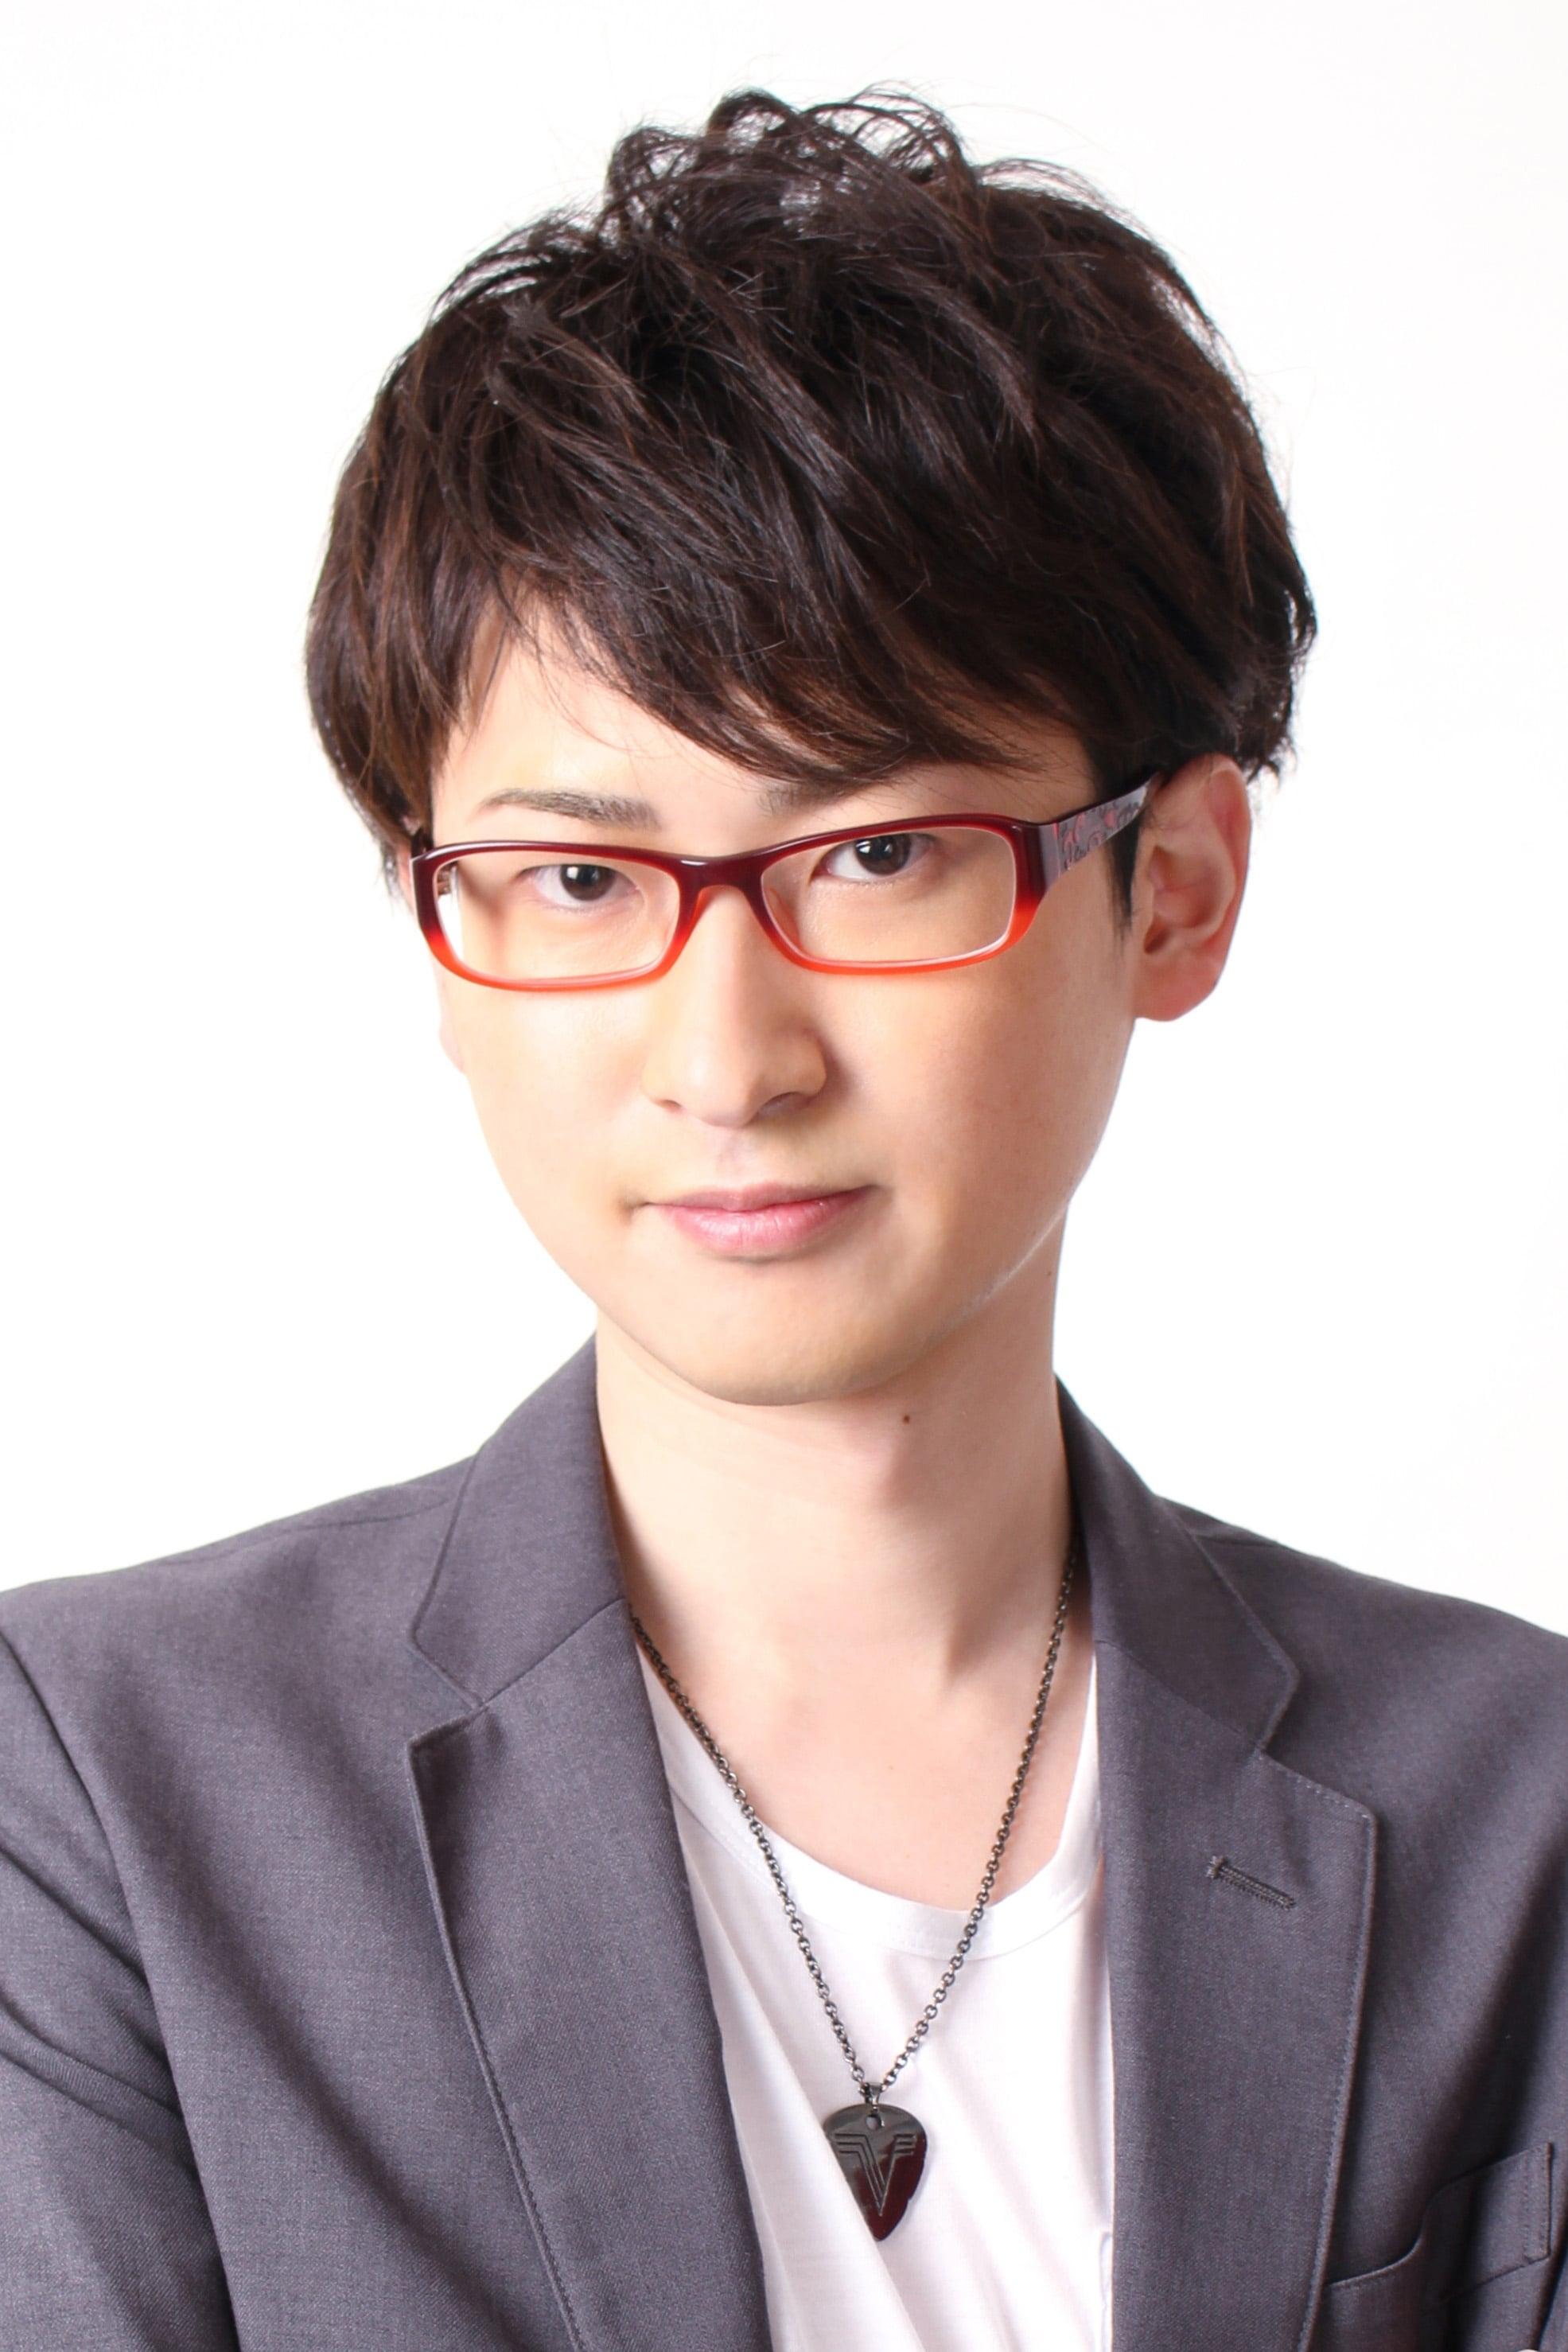 Katsuyuki Miura